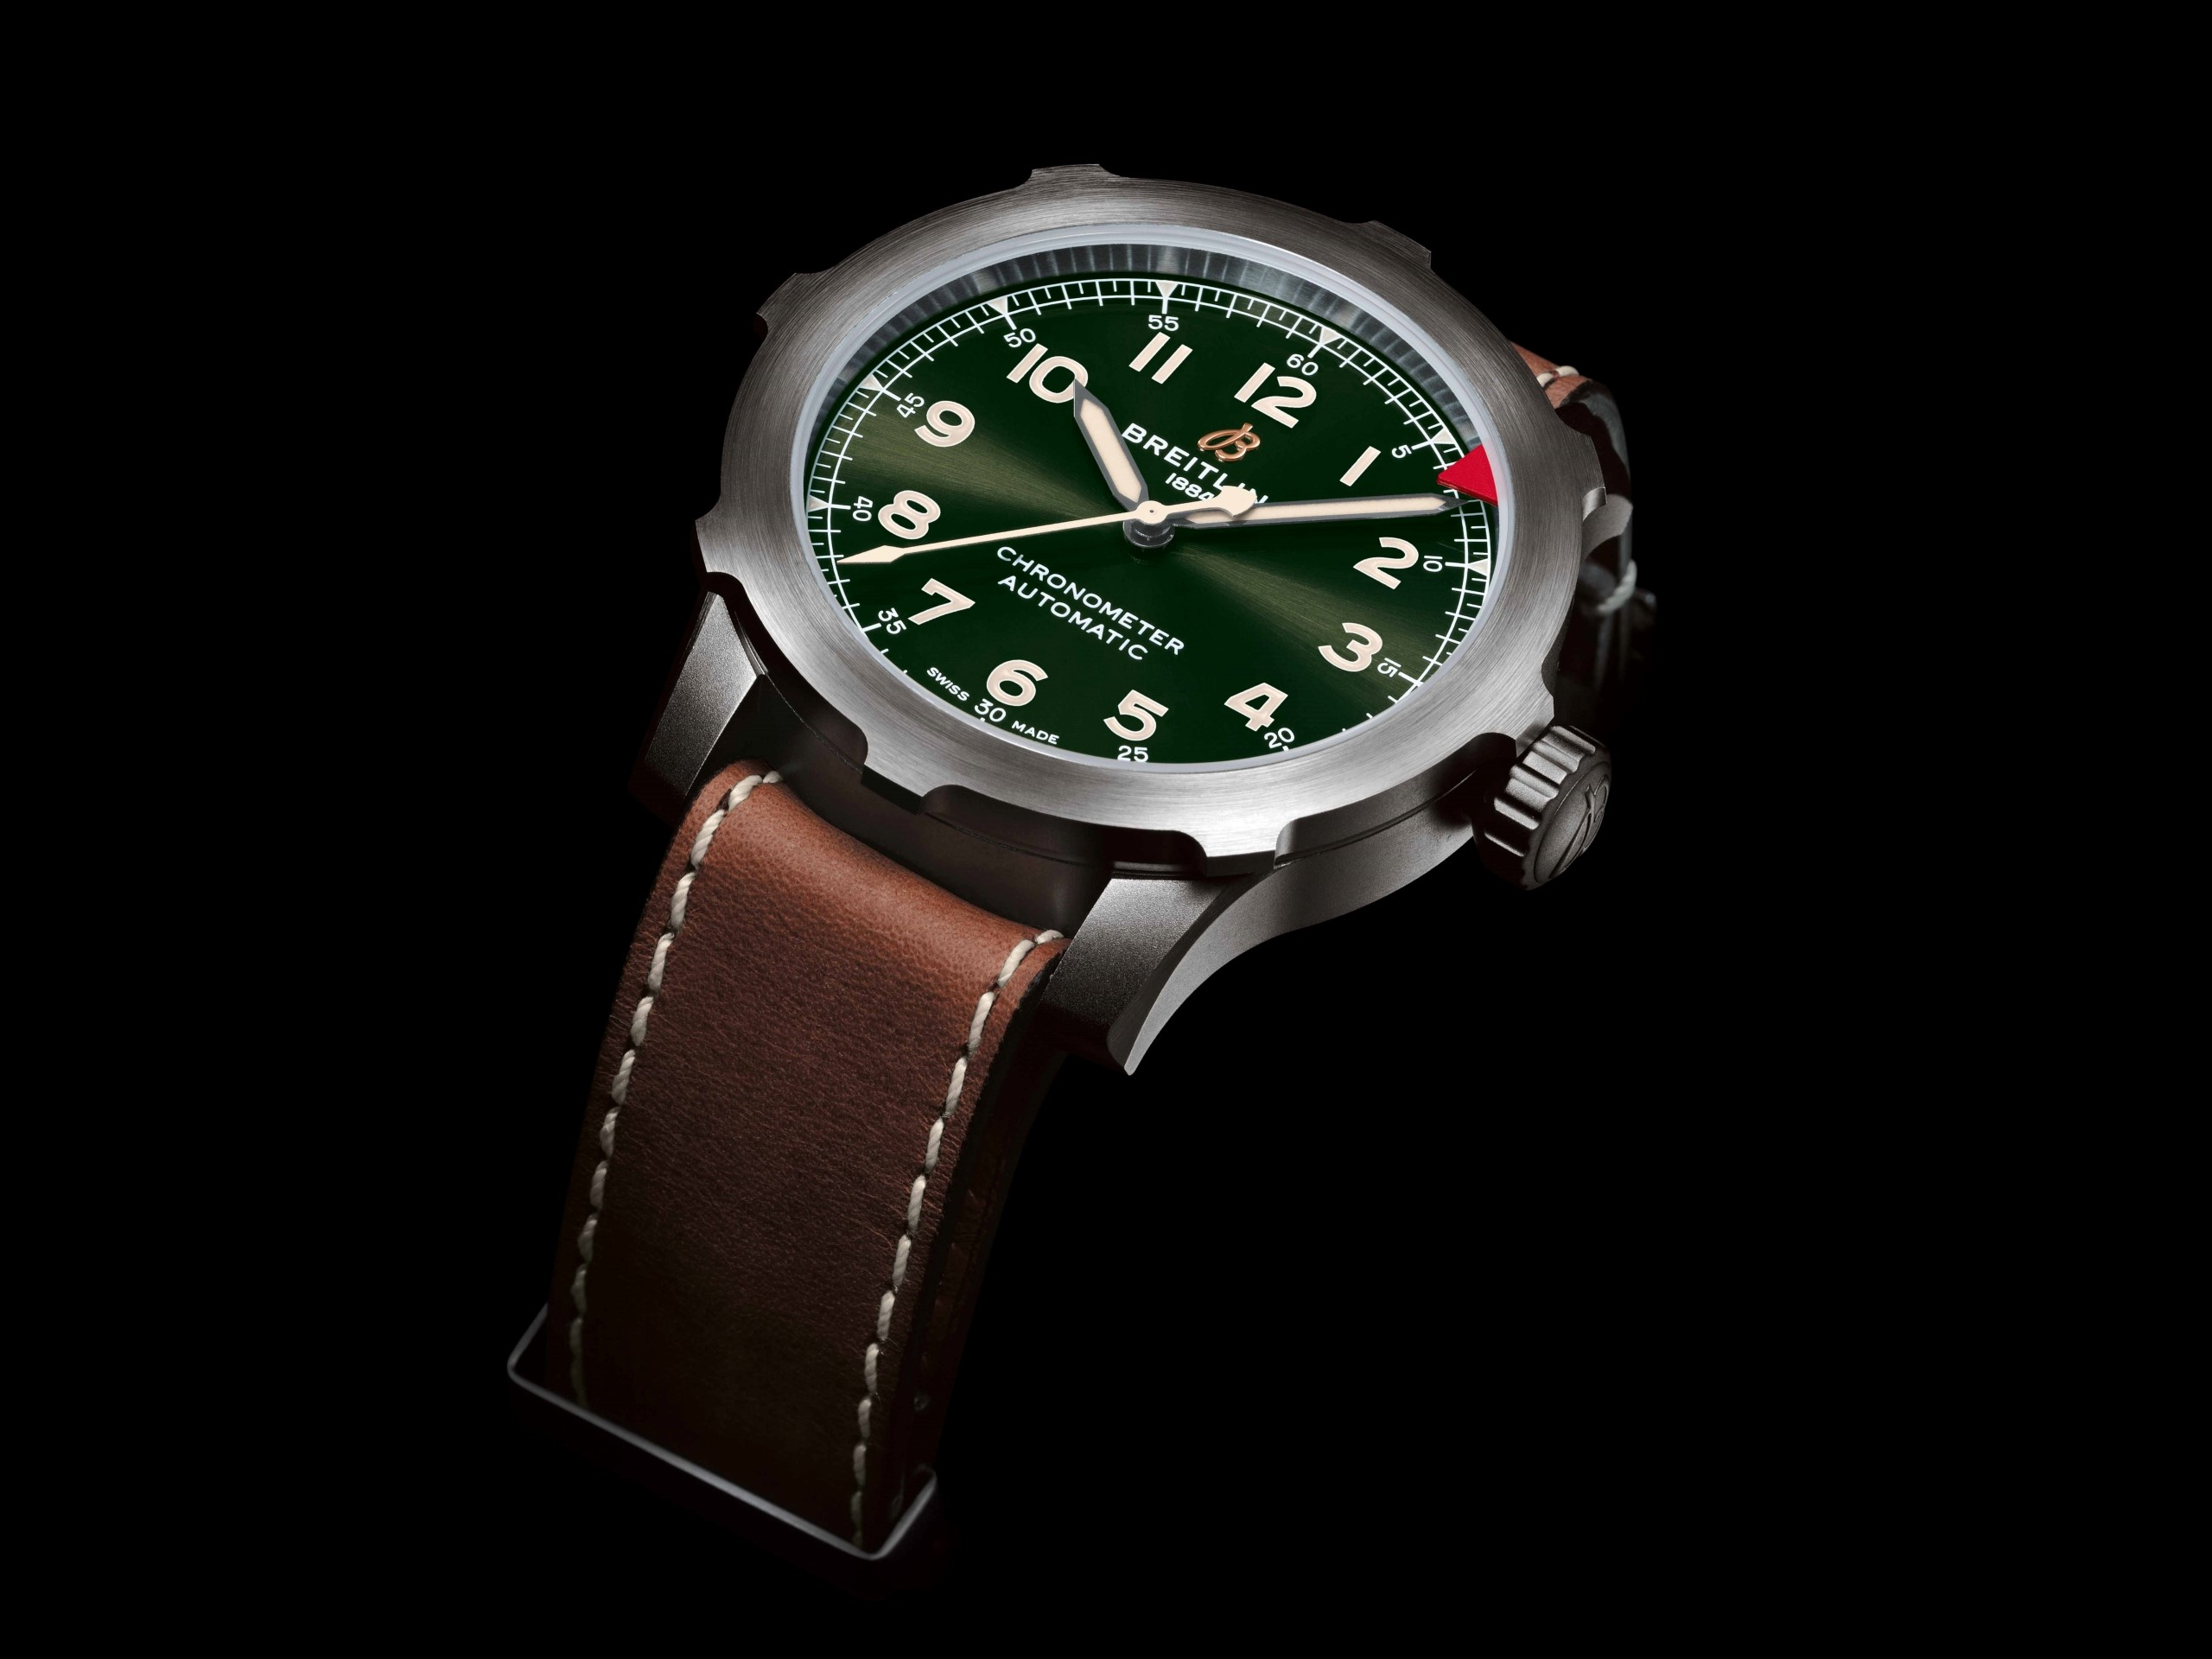 Zegarek Breitling Navitimer Super 8 B20 Automatic 46